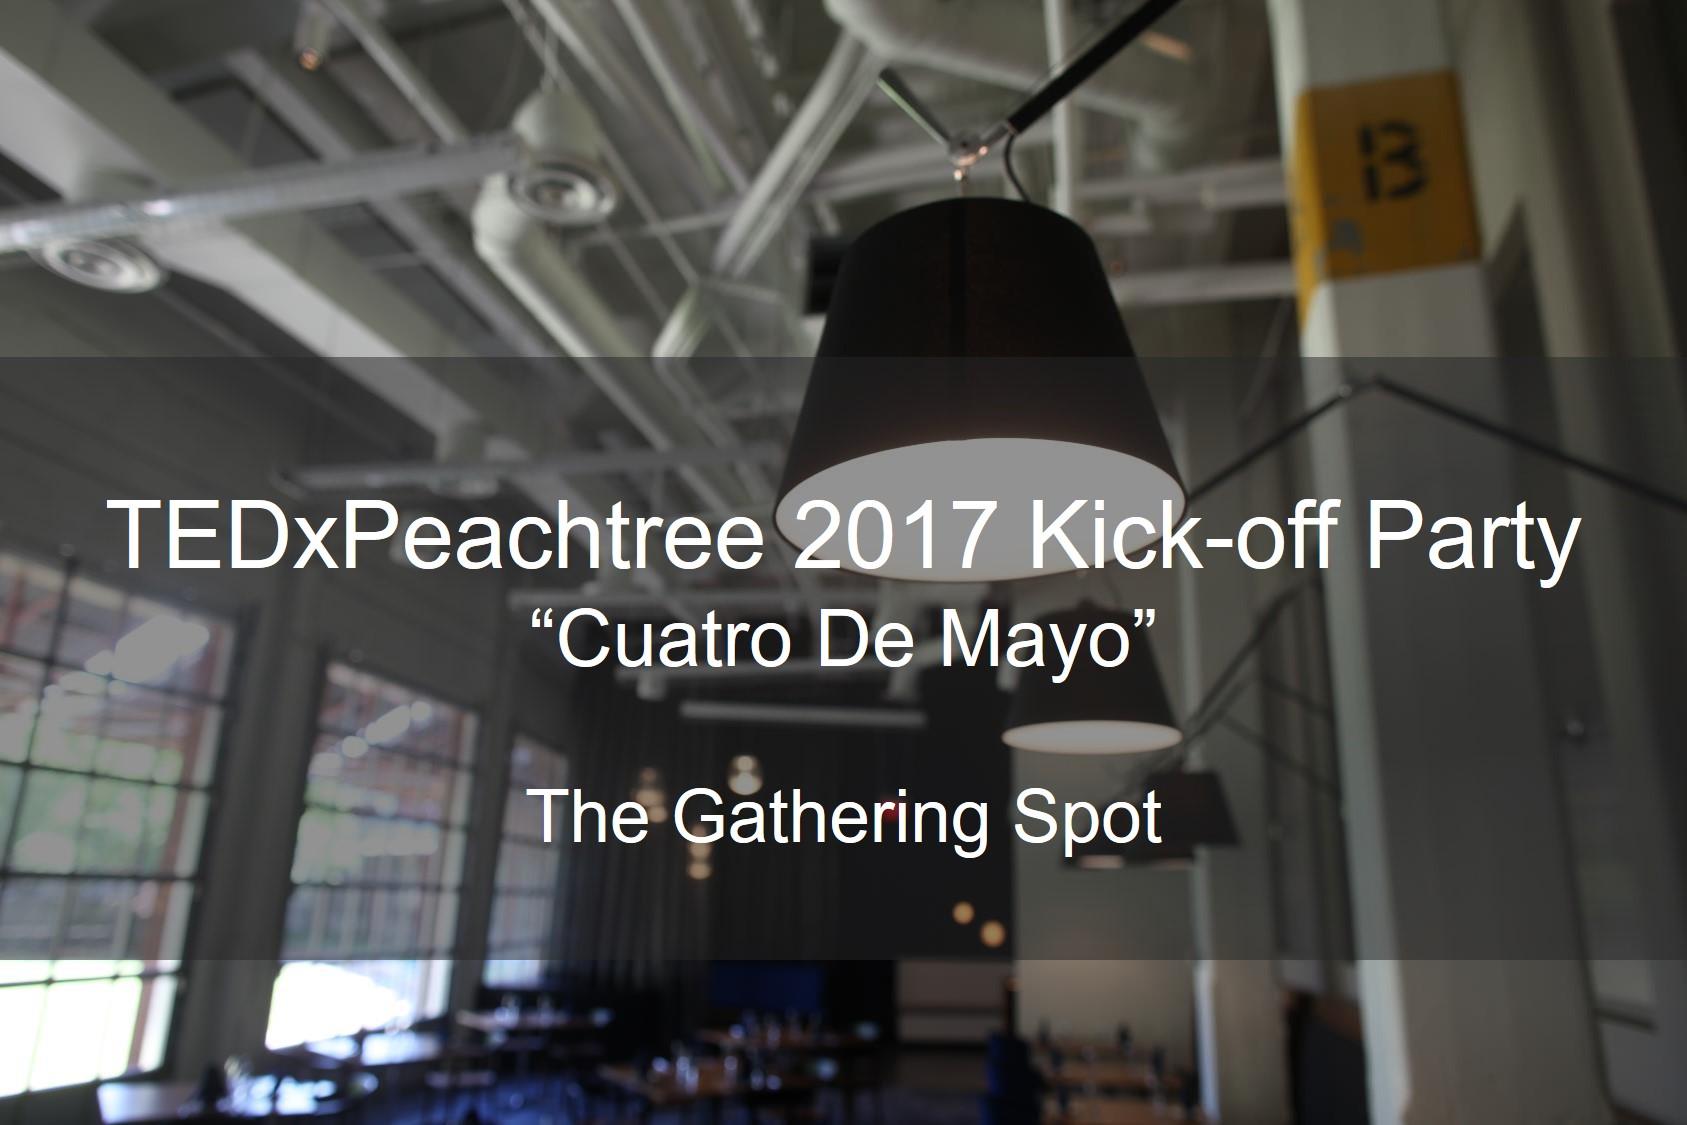 TEDxPeachtree cuatro de mayo party